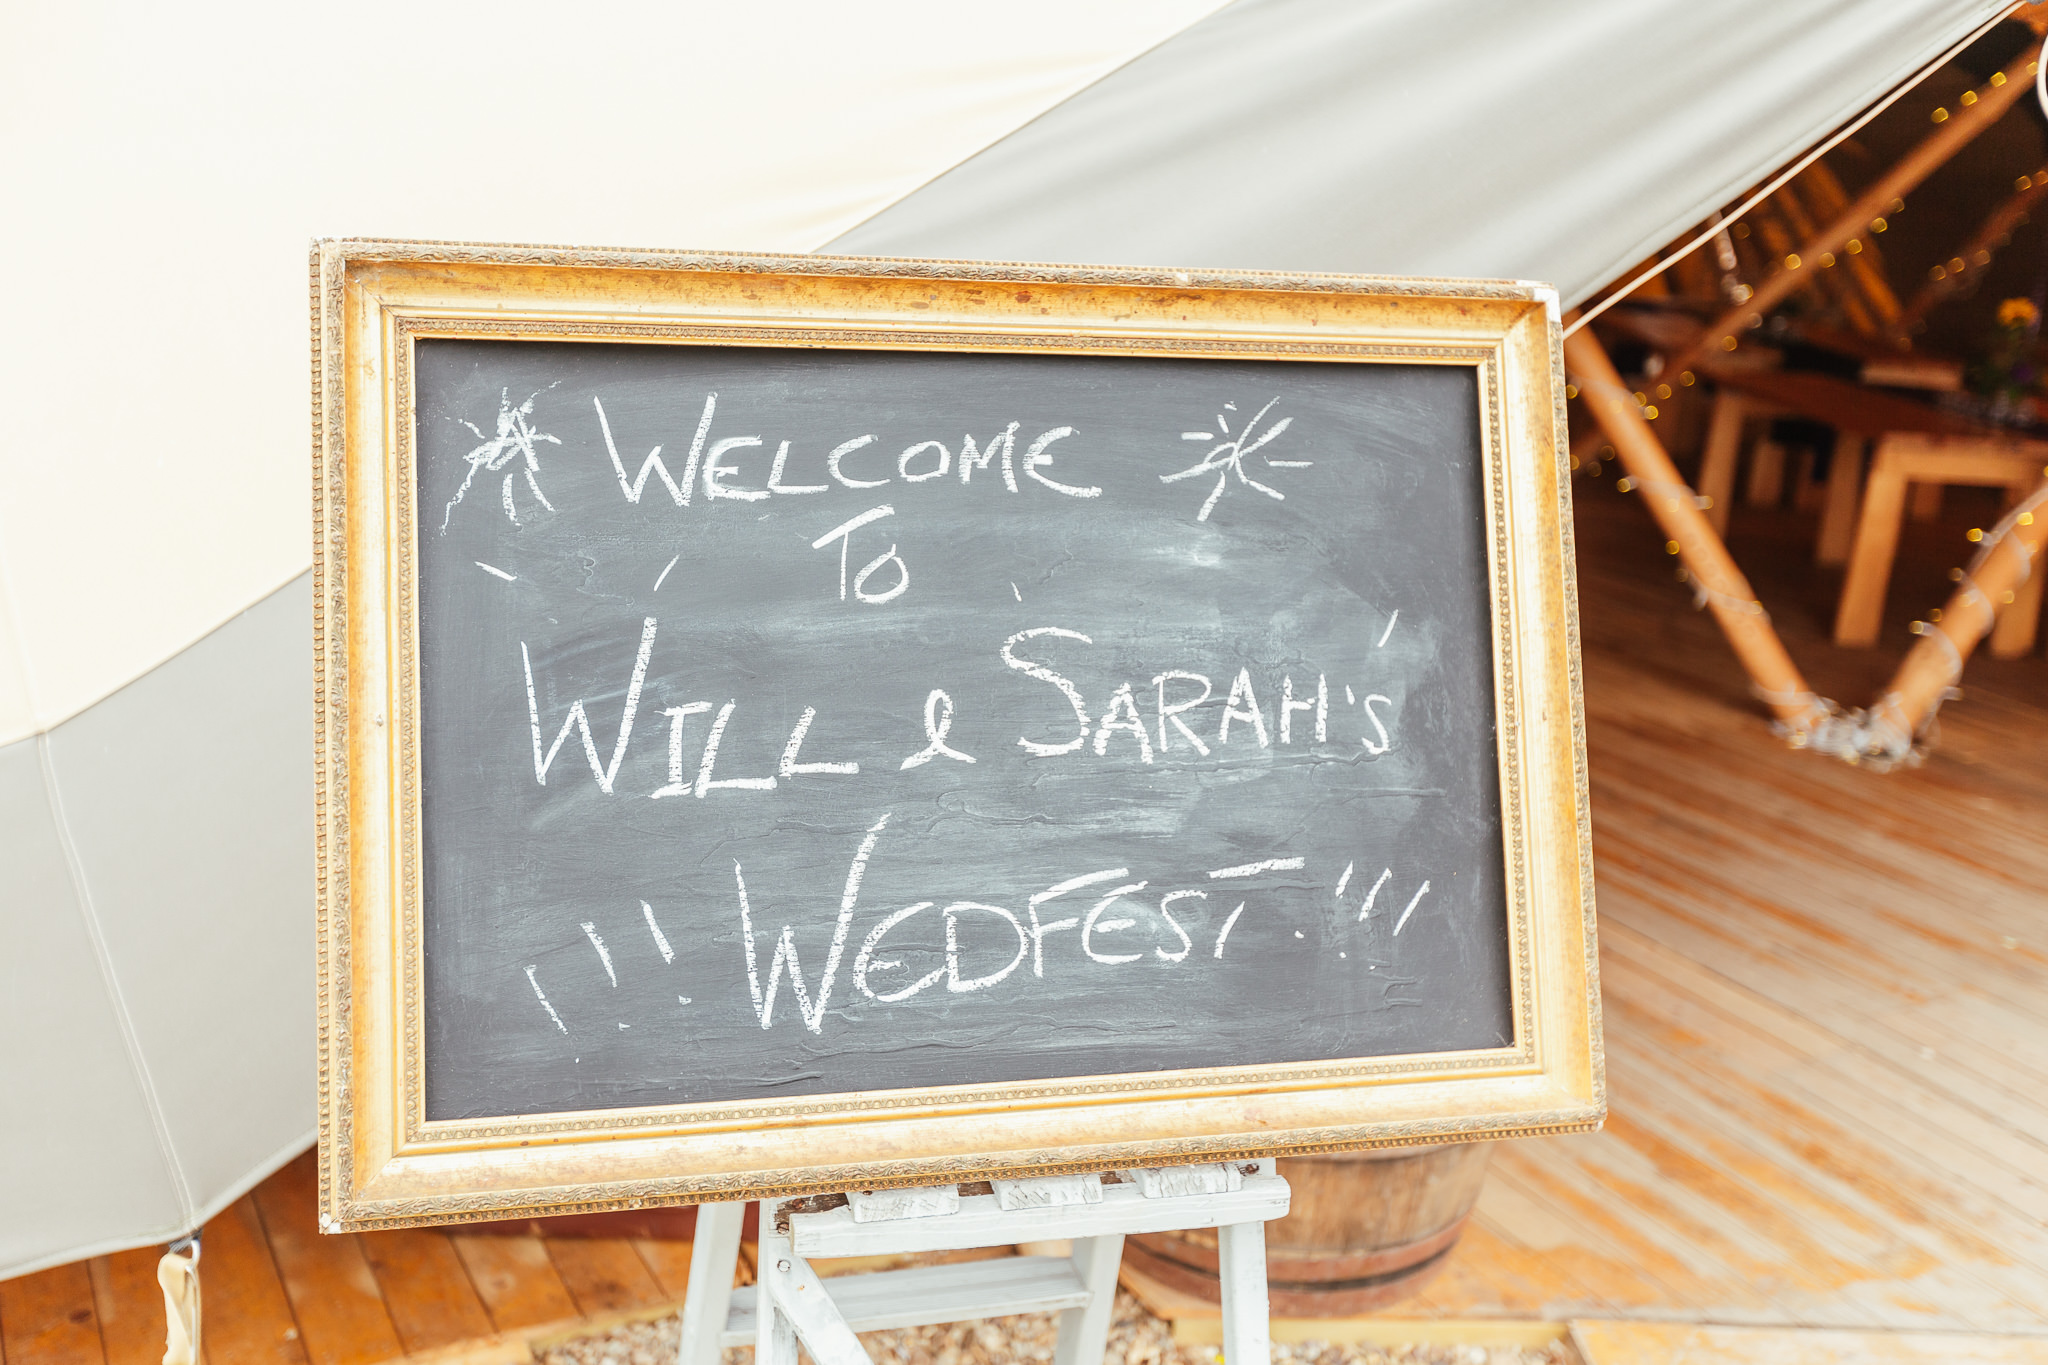 Inkersall-grange-farm-wedding-13.jpg